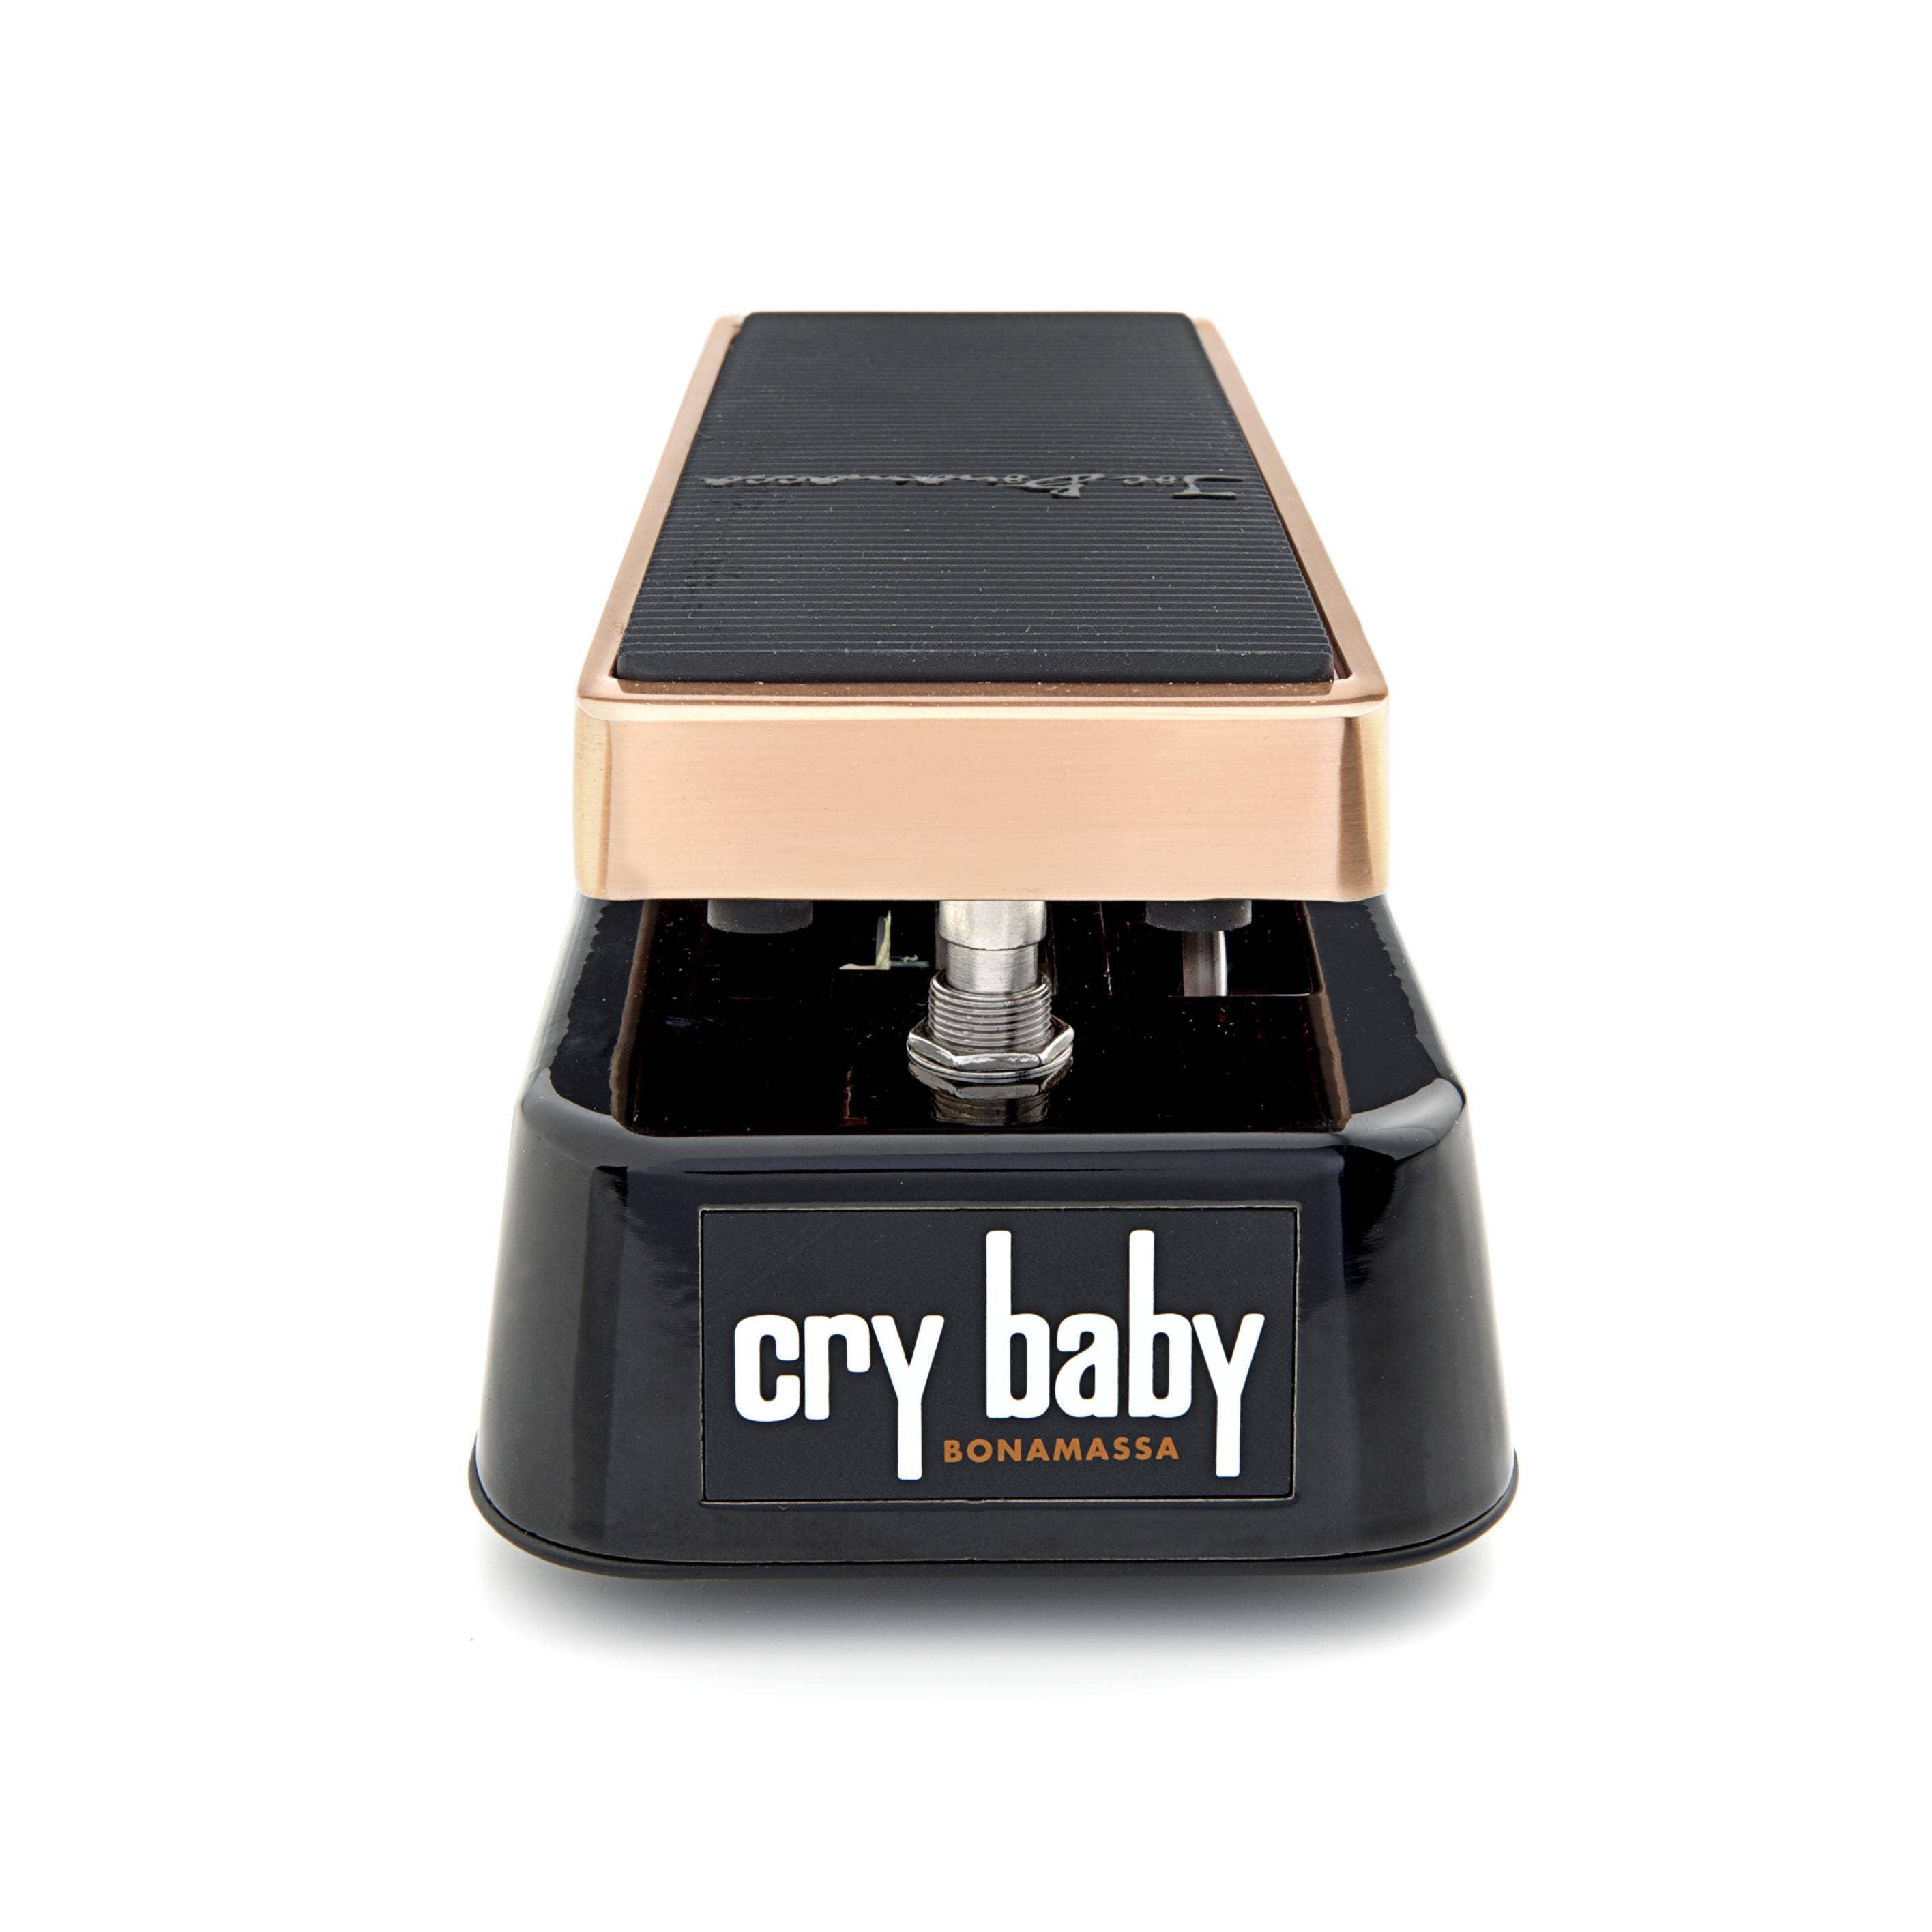 Dunlop JB95 Joe Bonamassa Cry Baby Wah Pedal for sale